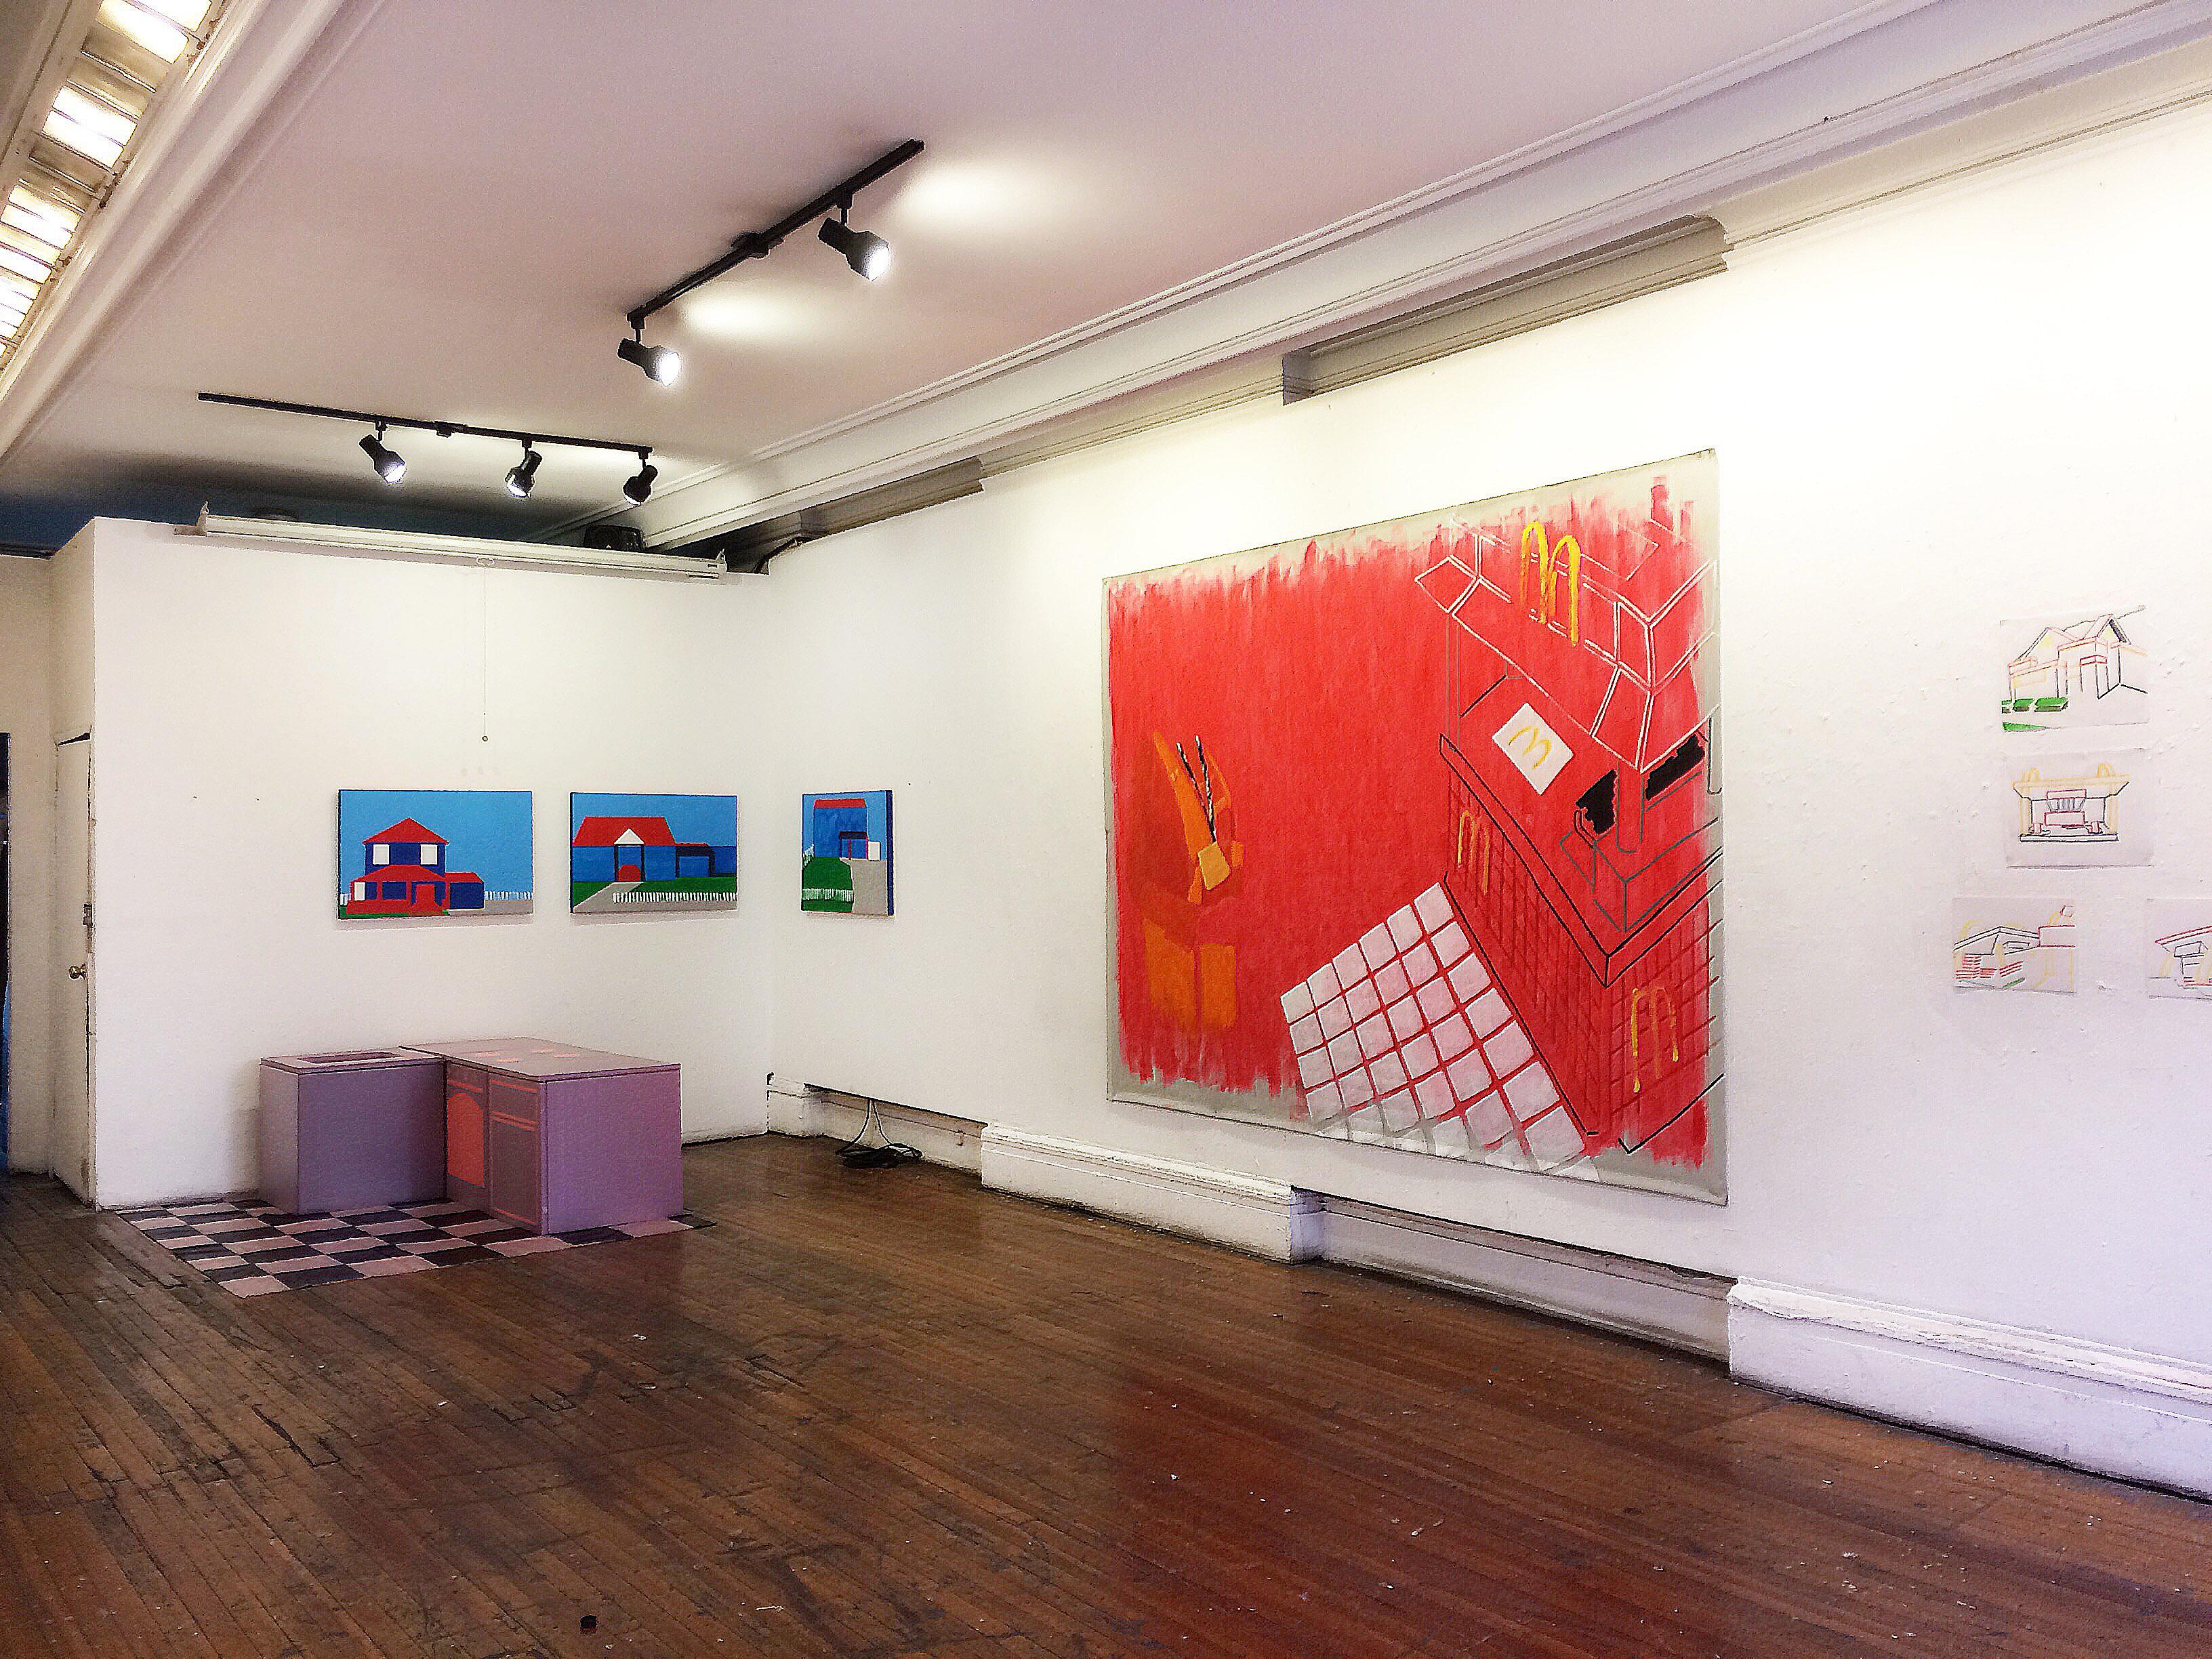 Exhibition at the New York Studio School